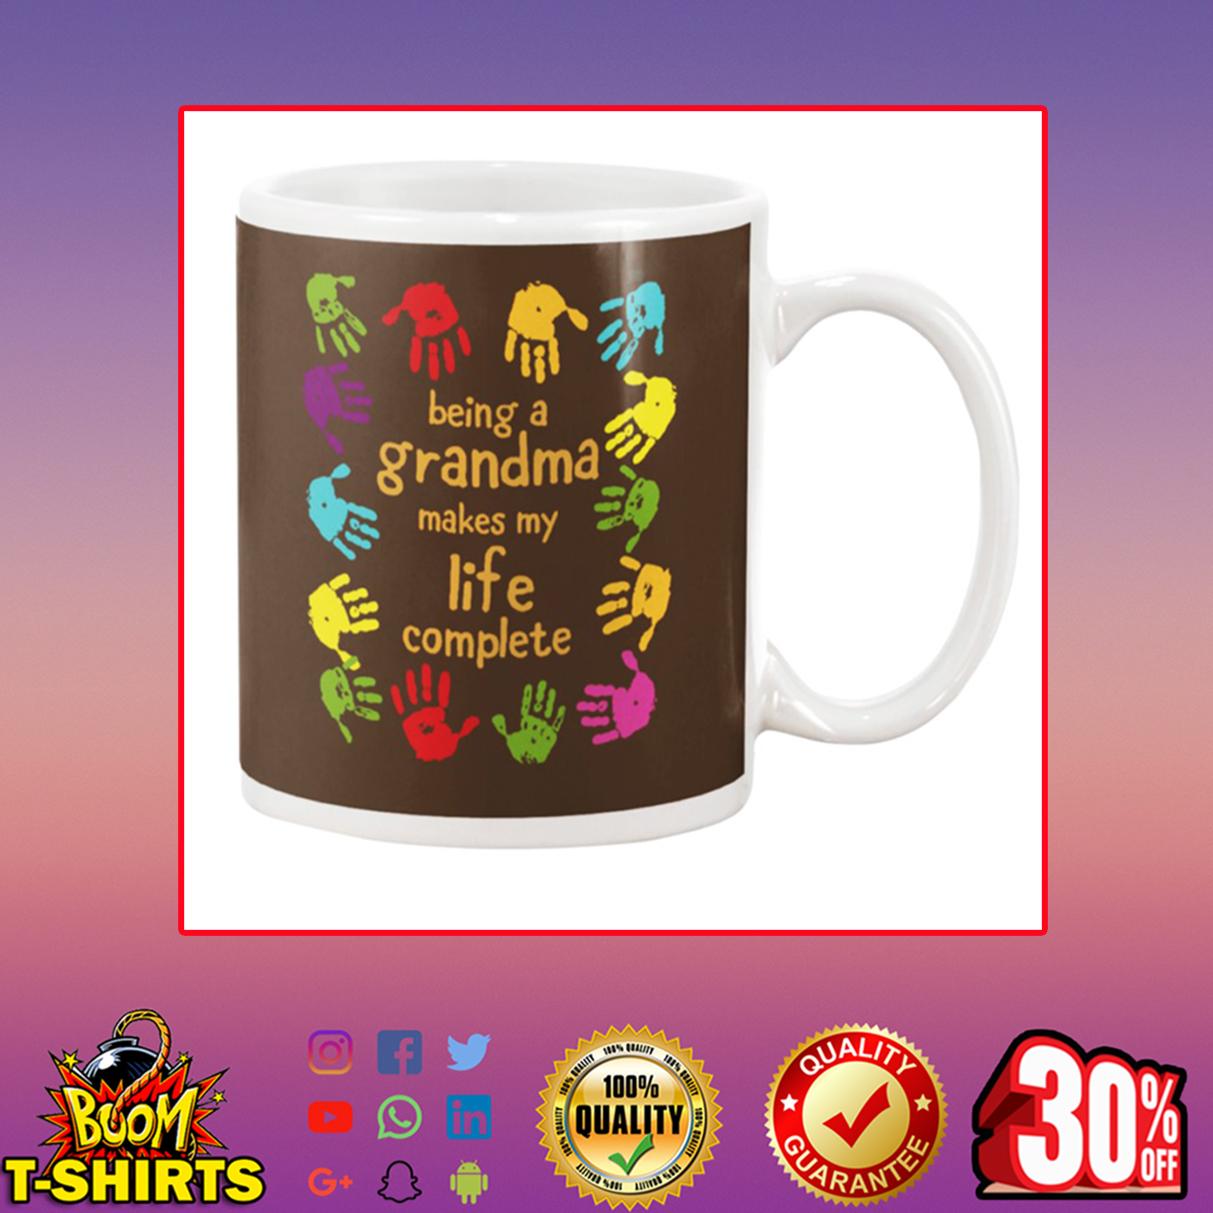 Handprint Being a grandma makes my life complete mug - chocolate